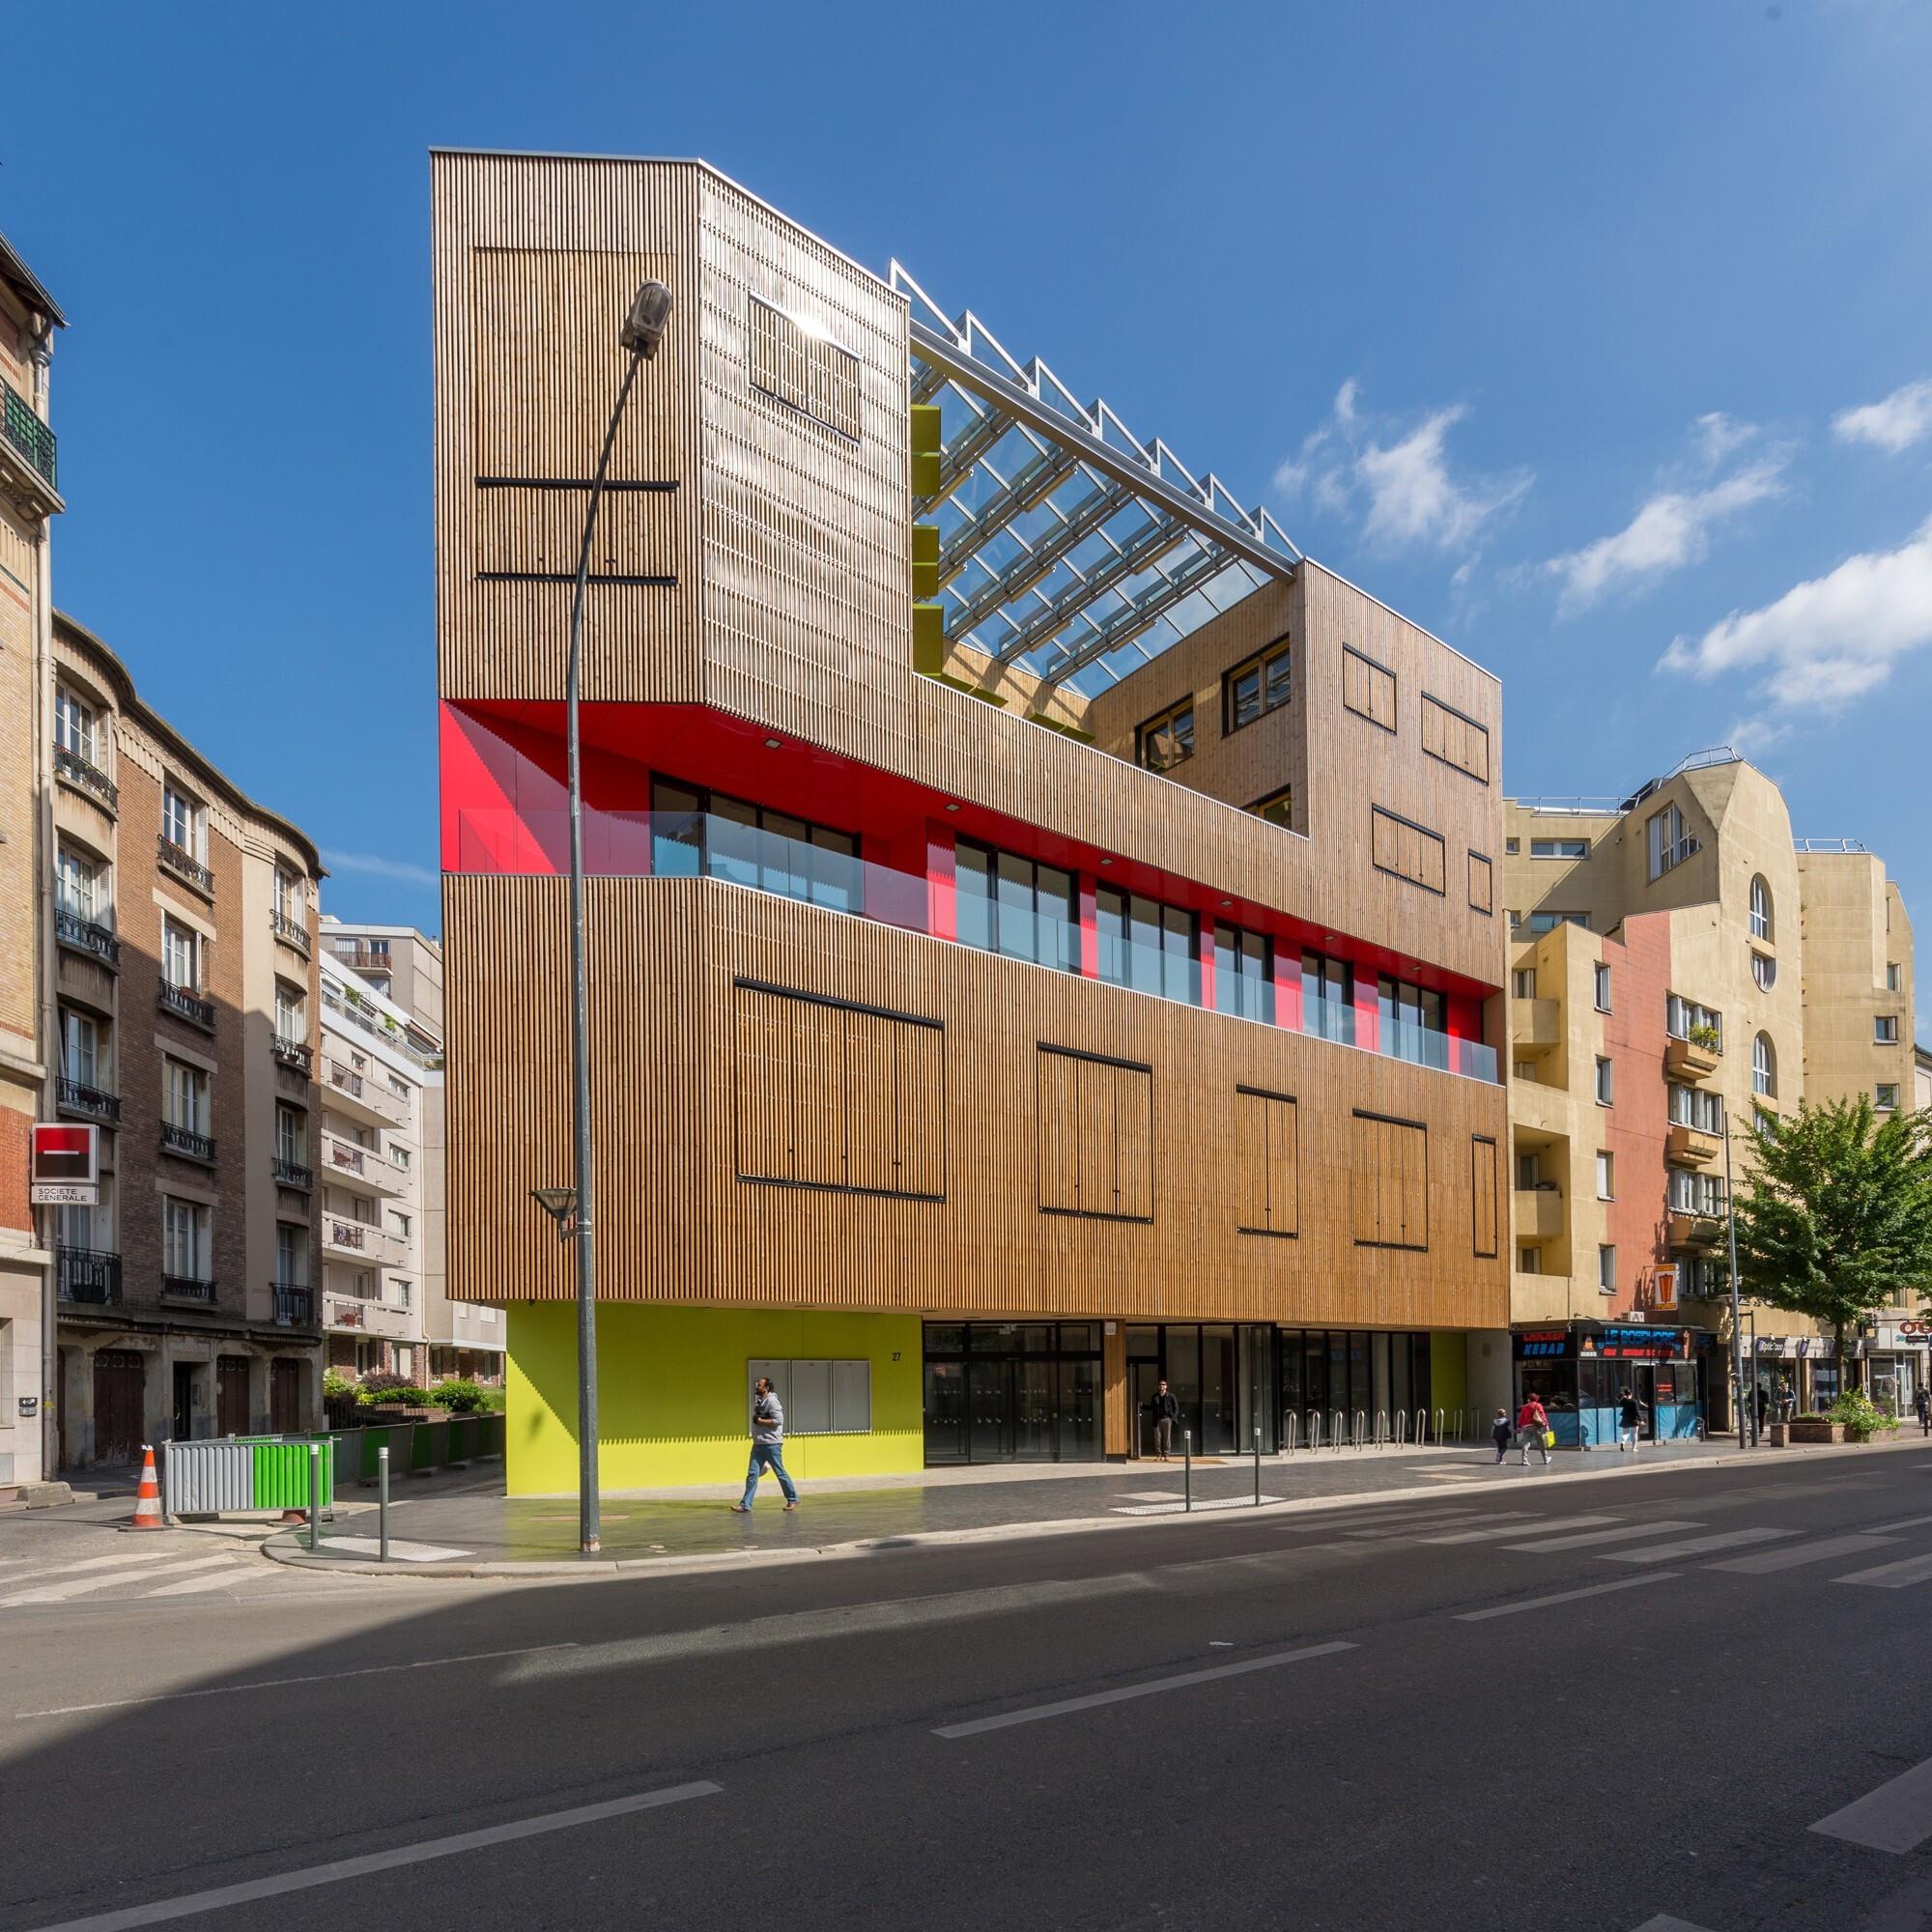 MVAC - Social club and Citizen's house